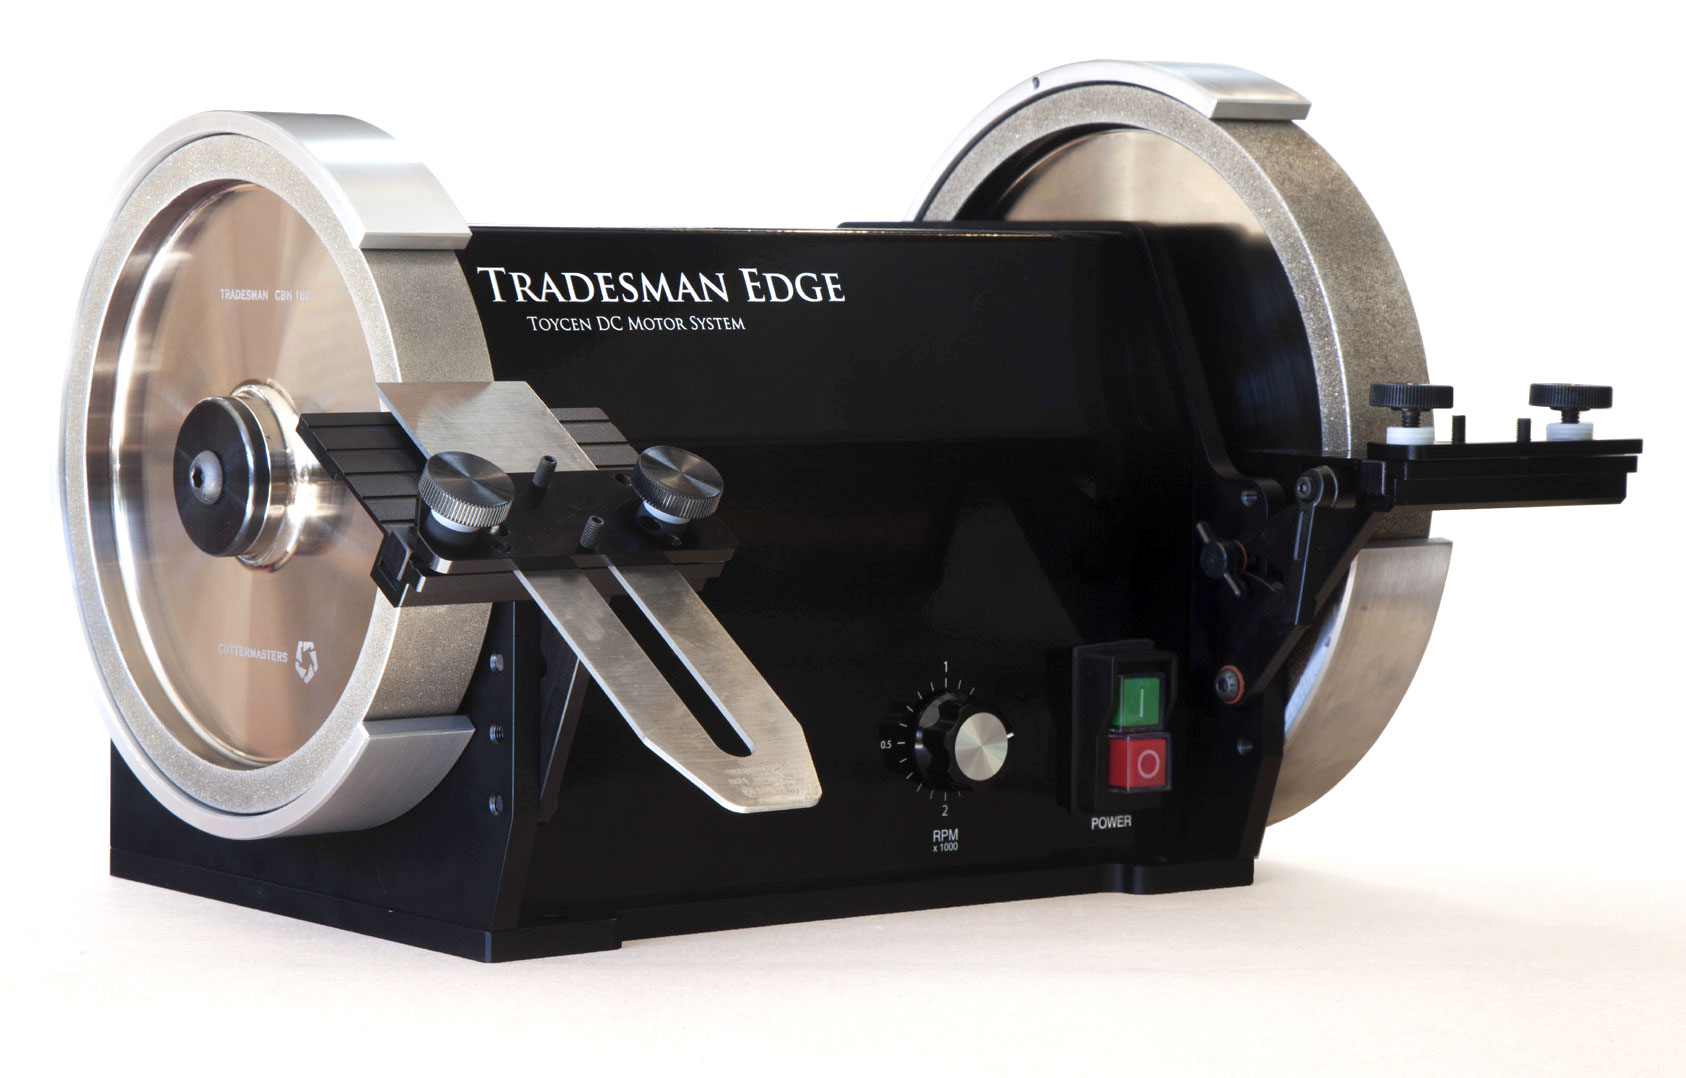 Tradesman Edge 810 DC Variable Speed Bench Grinder